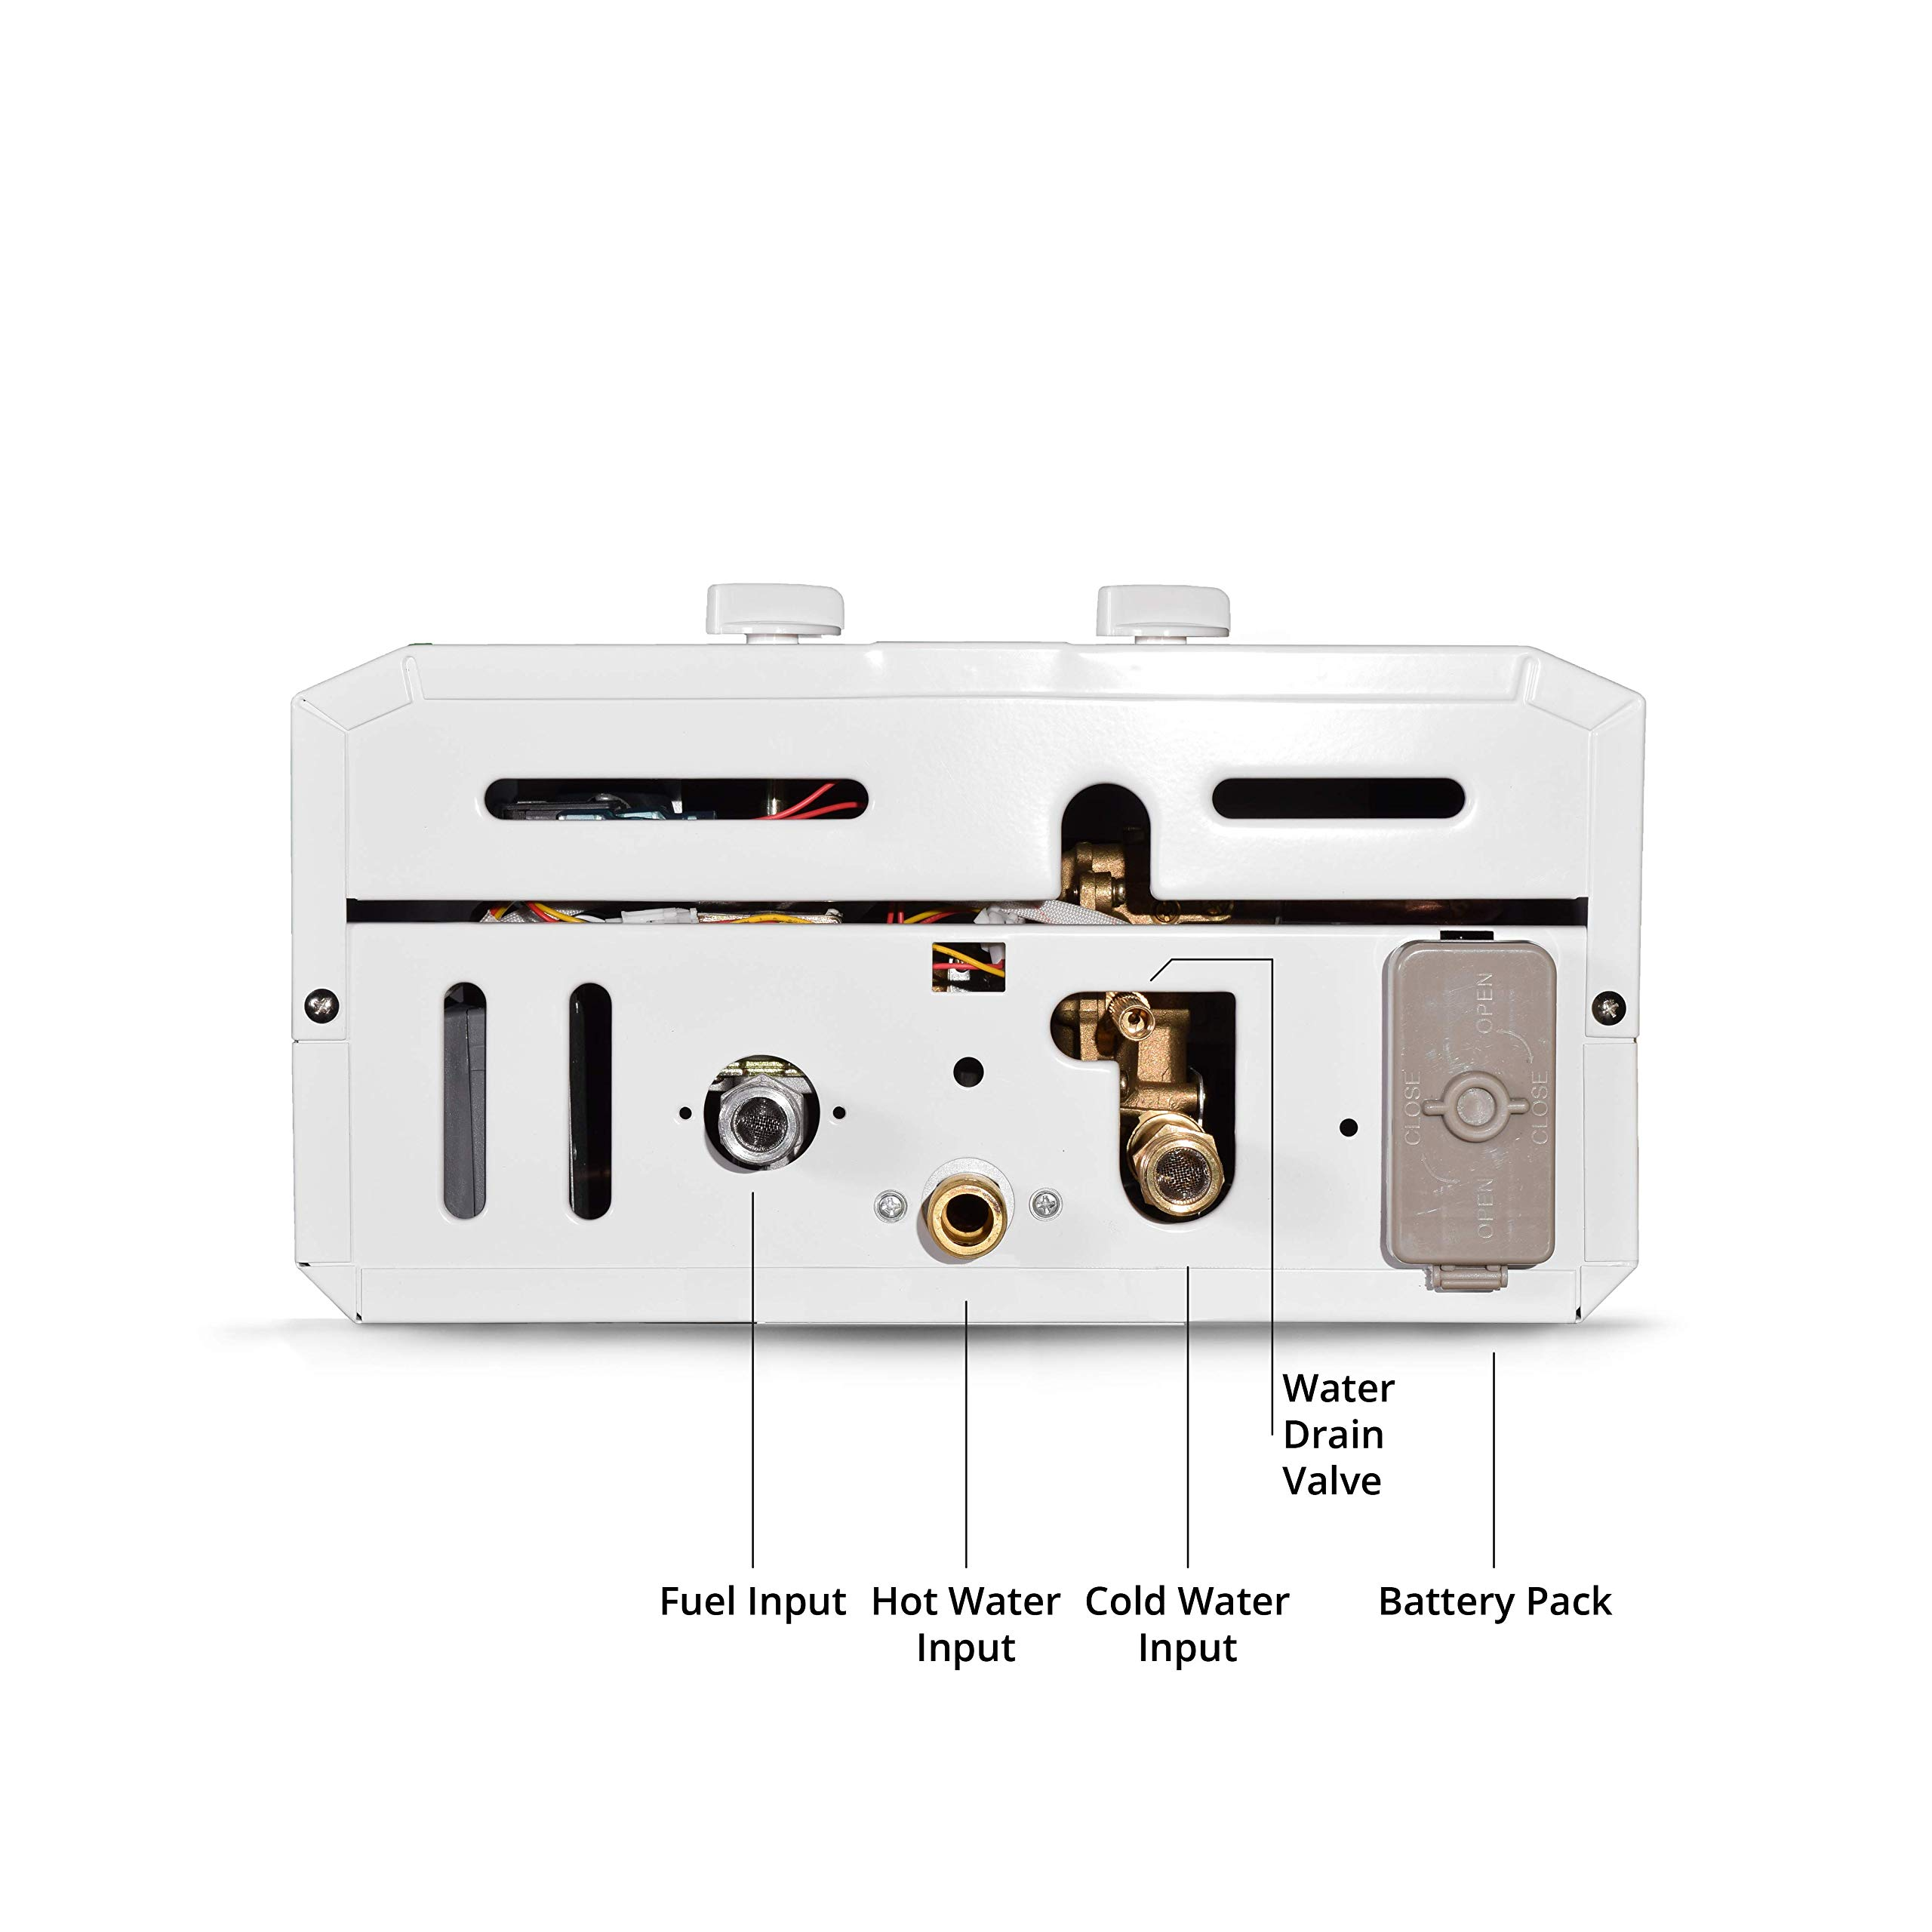 37 mbar Strainer /& Shower Set Eccotemp CE-L10 Portable Outdoor Tankless Water Heater w//EccoFlo Diaphragm 12V Pump